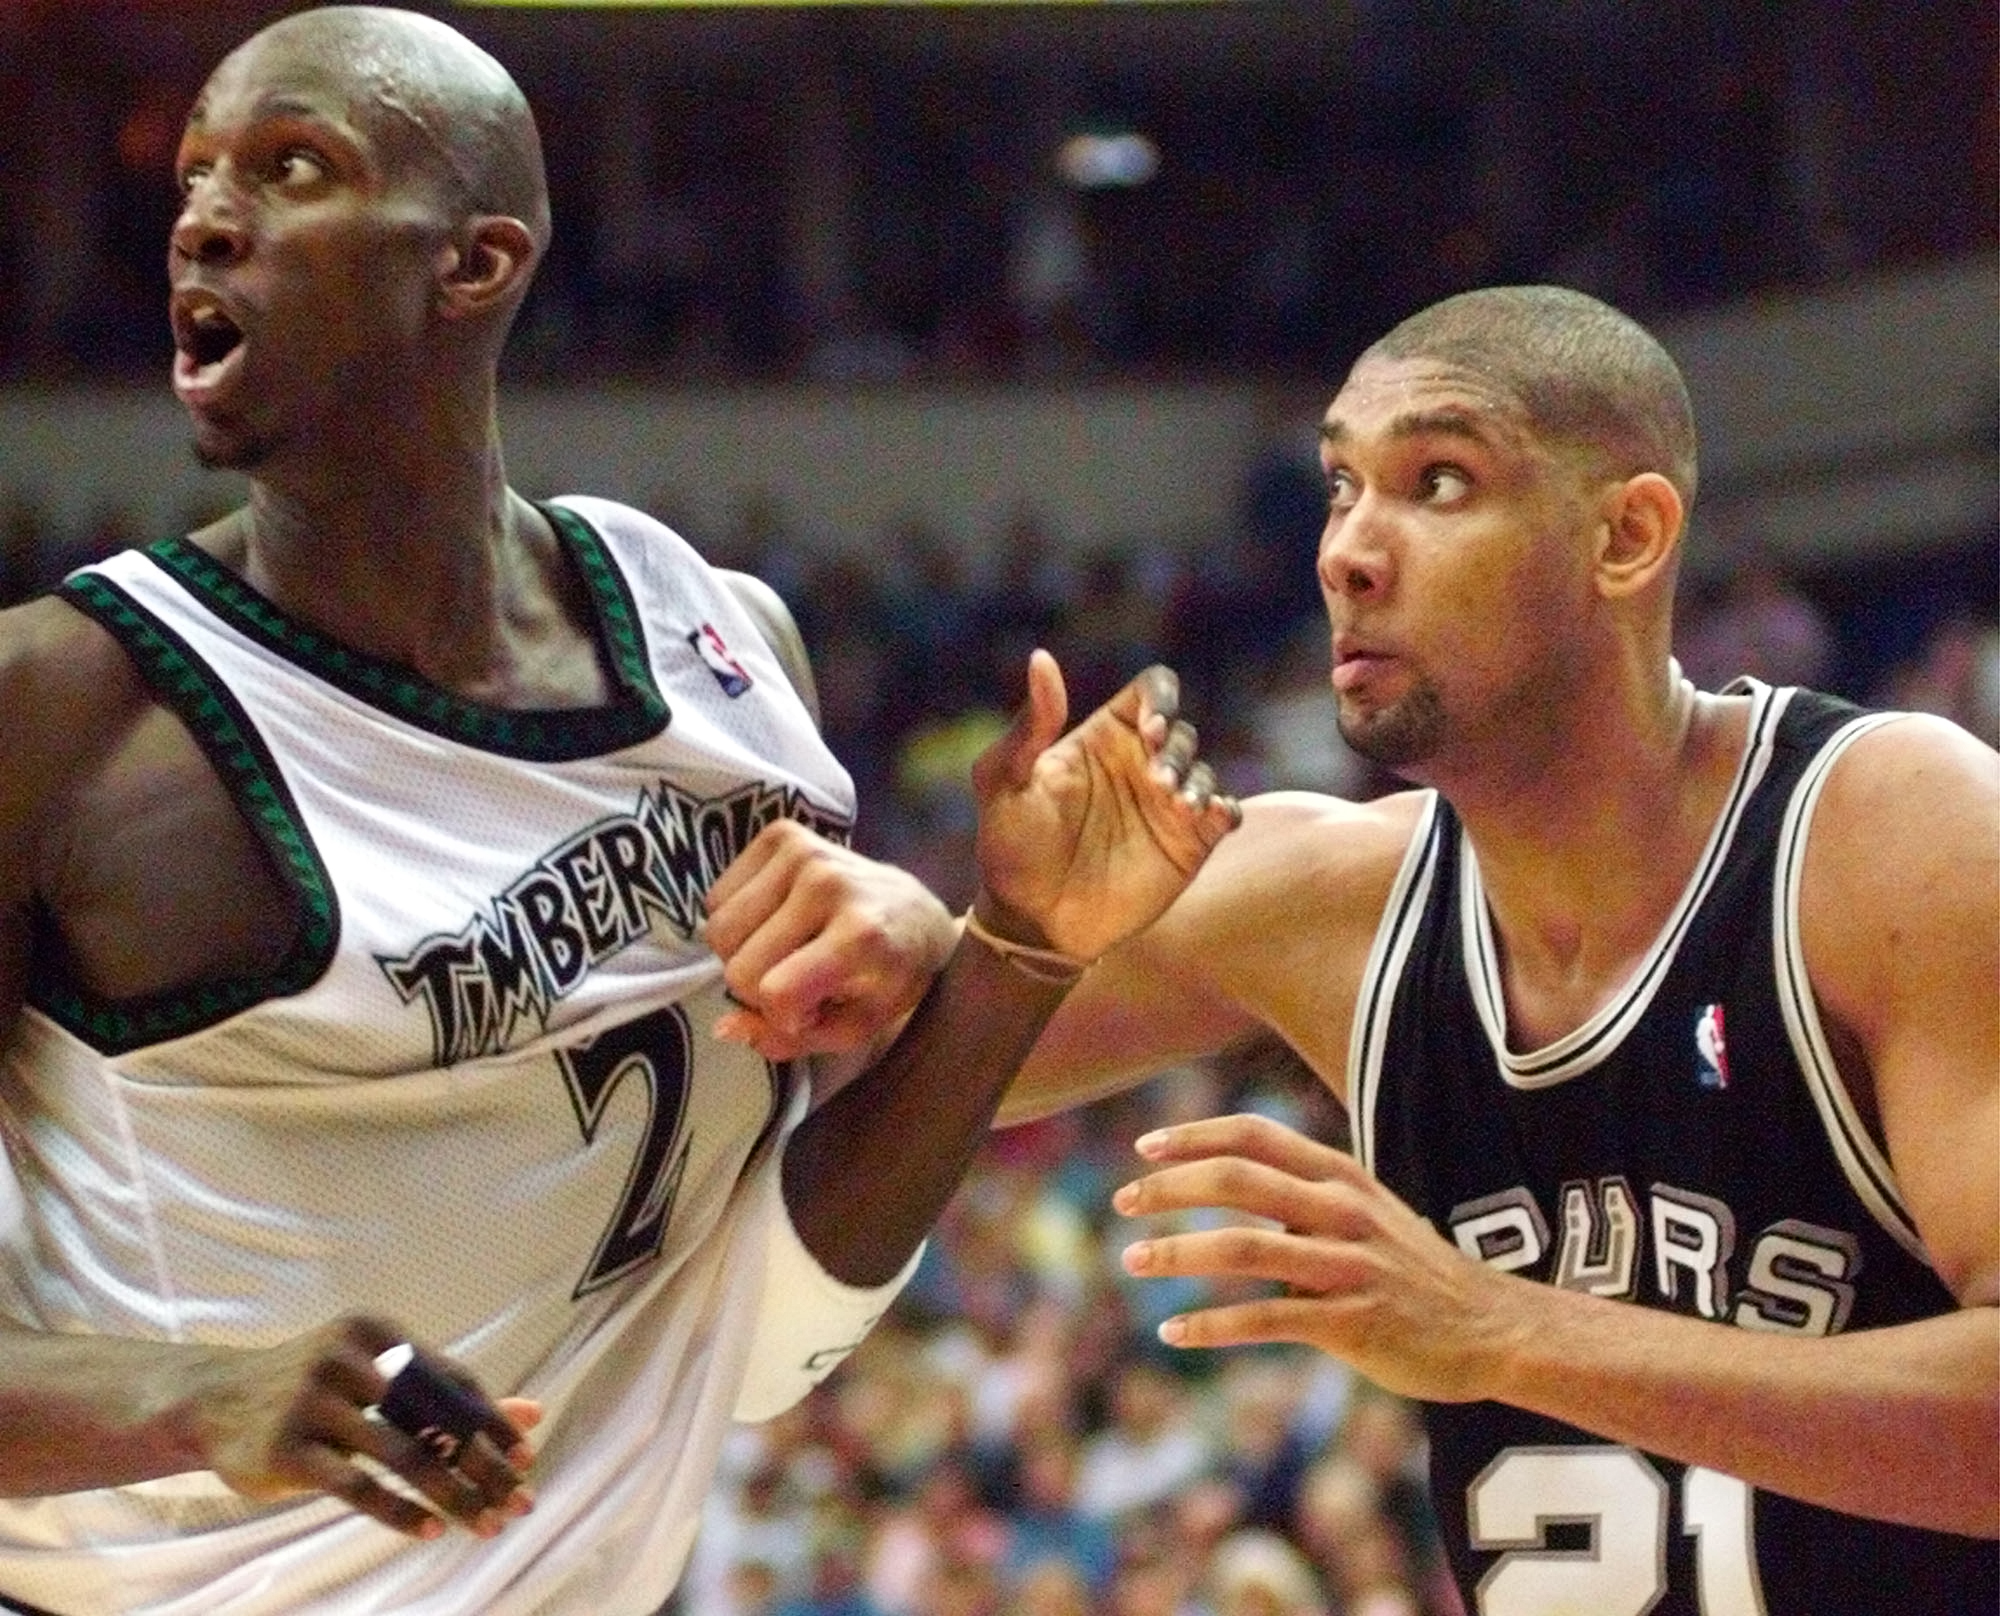 'Timmy would hit you in phrases': Kevin Garnett described Tim Duncan's trash talk